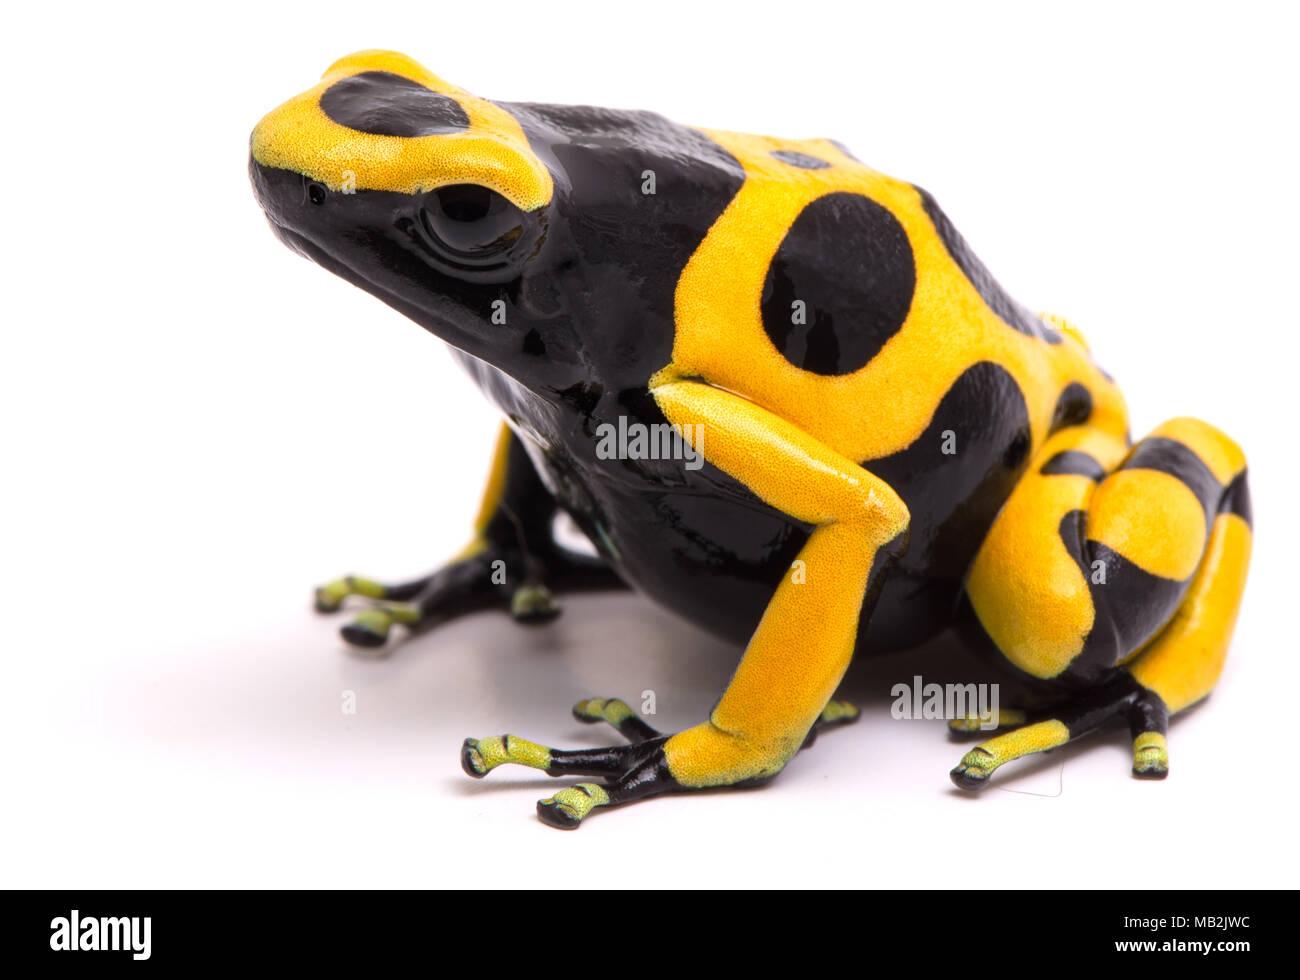 Venezuela Frog Stock Photos Amp Venezuela Frog Stock Images